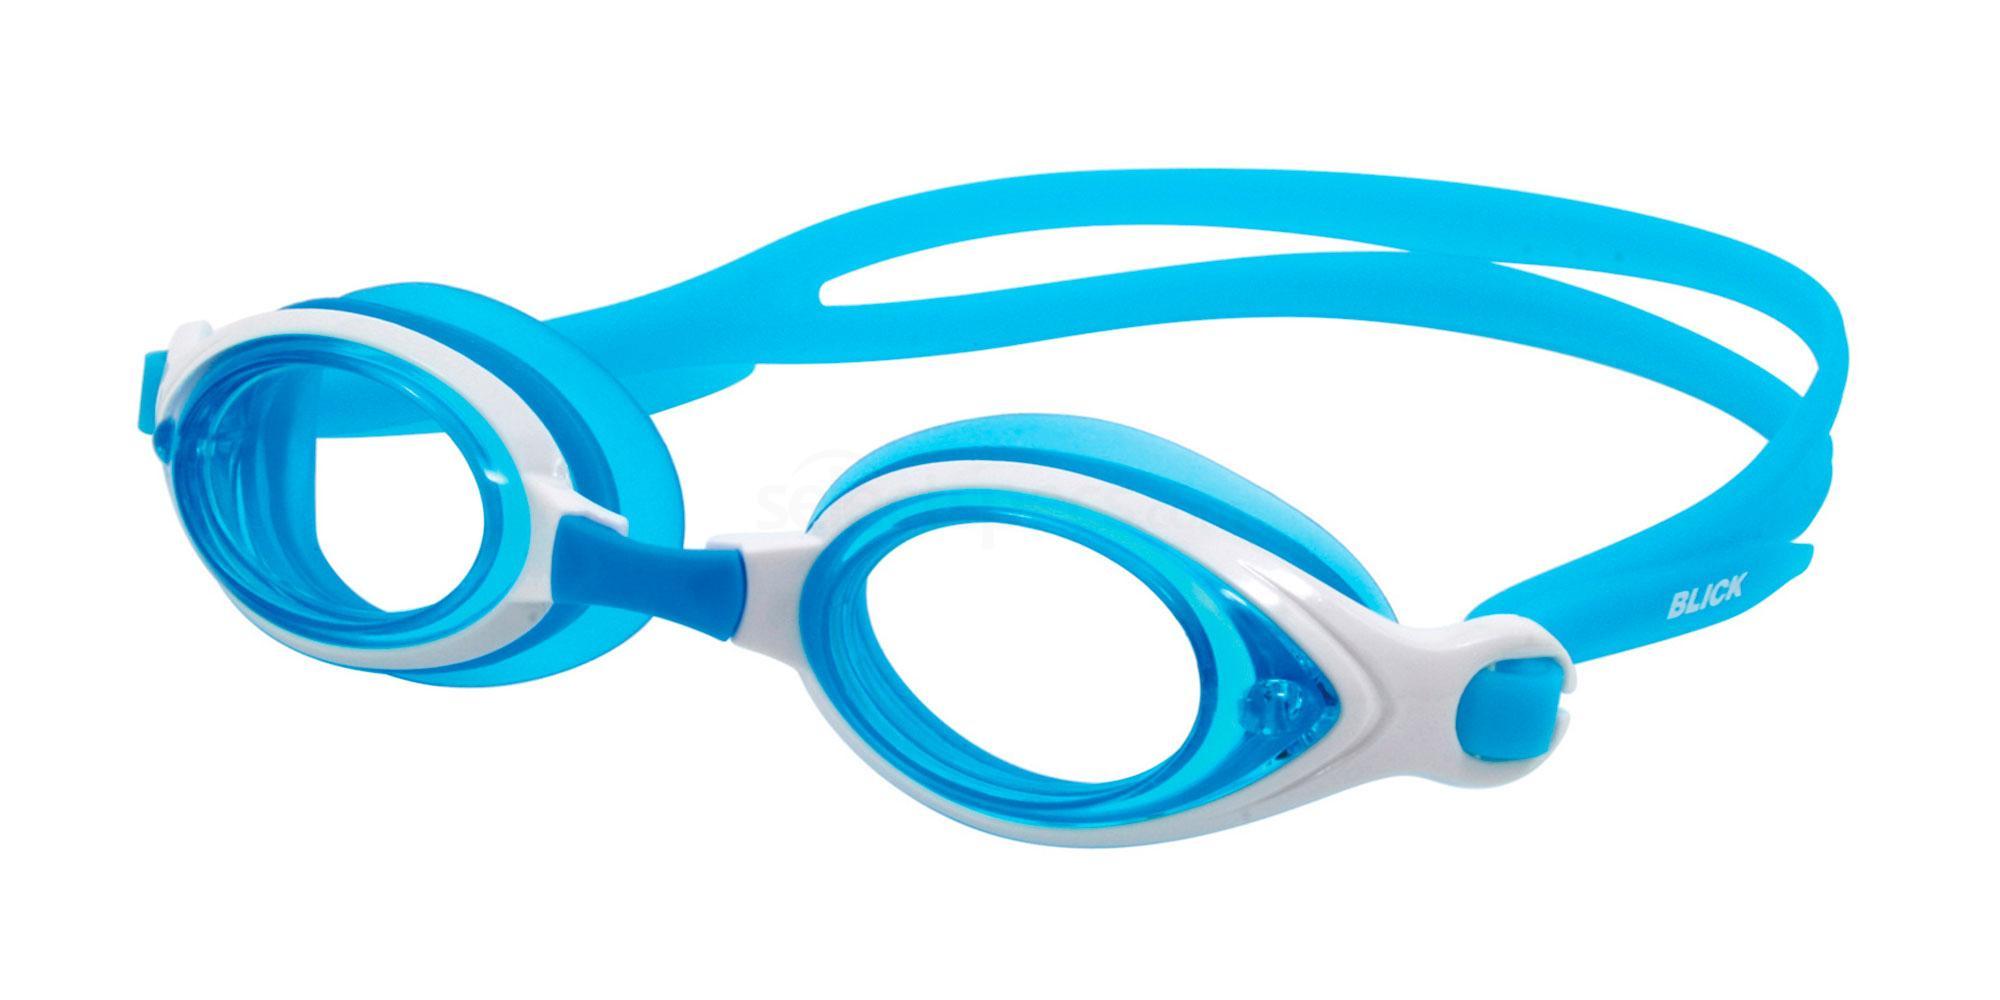 Blue Blick Junior (5-12 years) Accessories, Sports Eyewear Kids